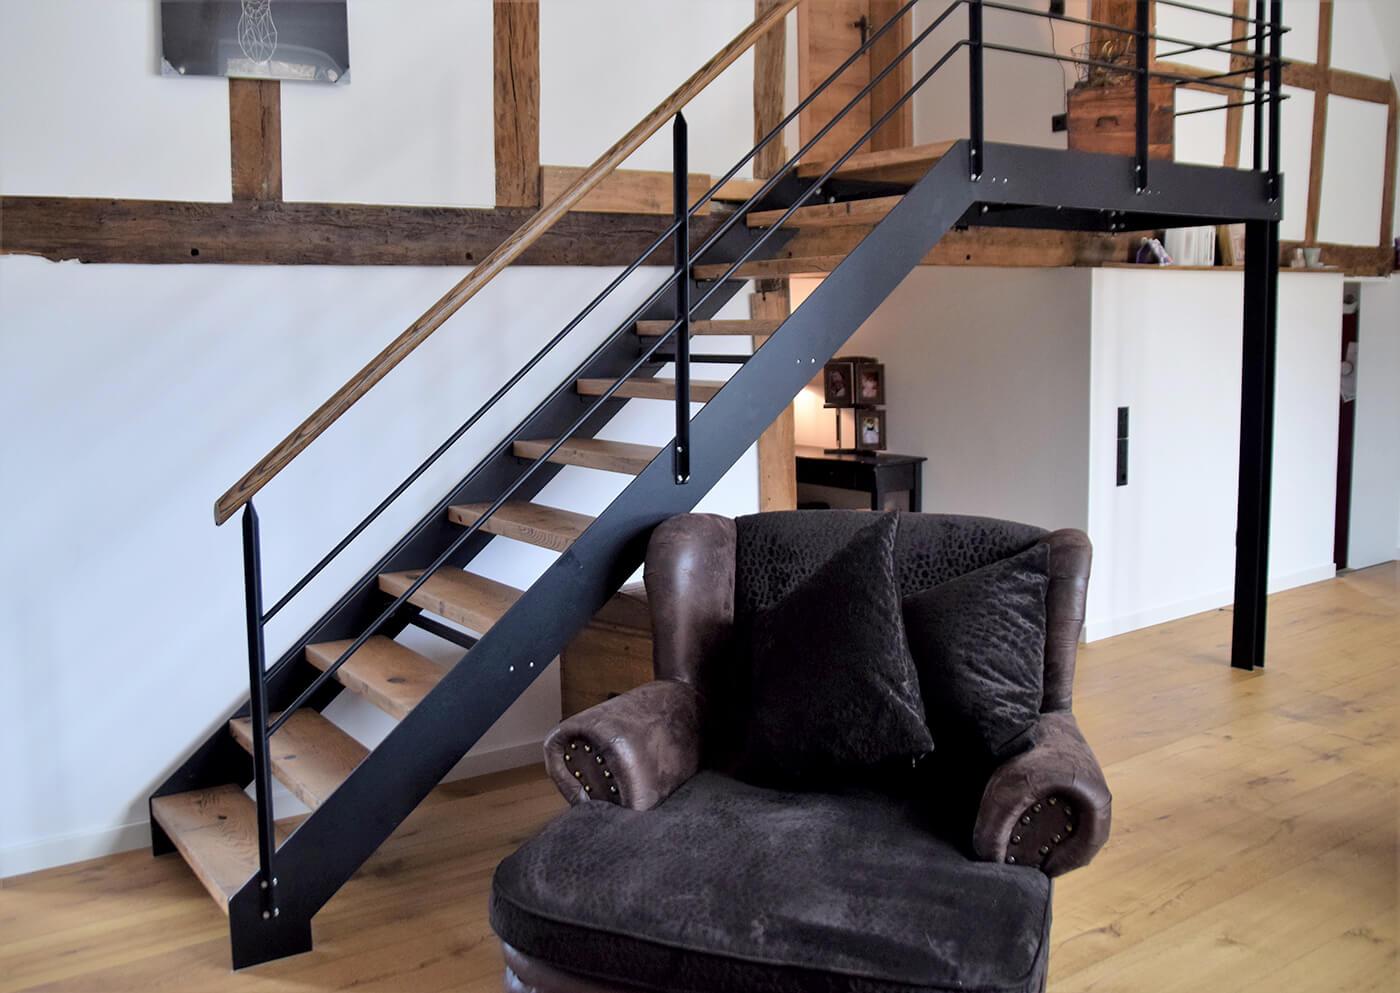 Eichentreppe Treppe Holztreppe Treppe aus Holz Innentreppe Innentreppe aus Holz Treppenbau Treppenstufen Holz Treppe Holz